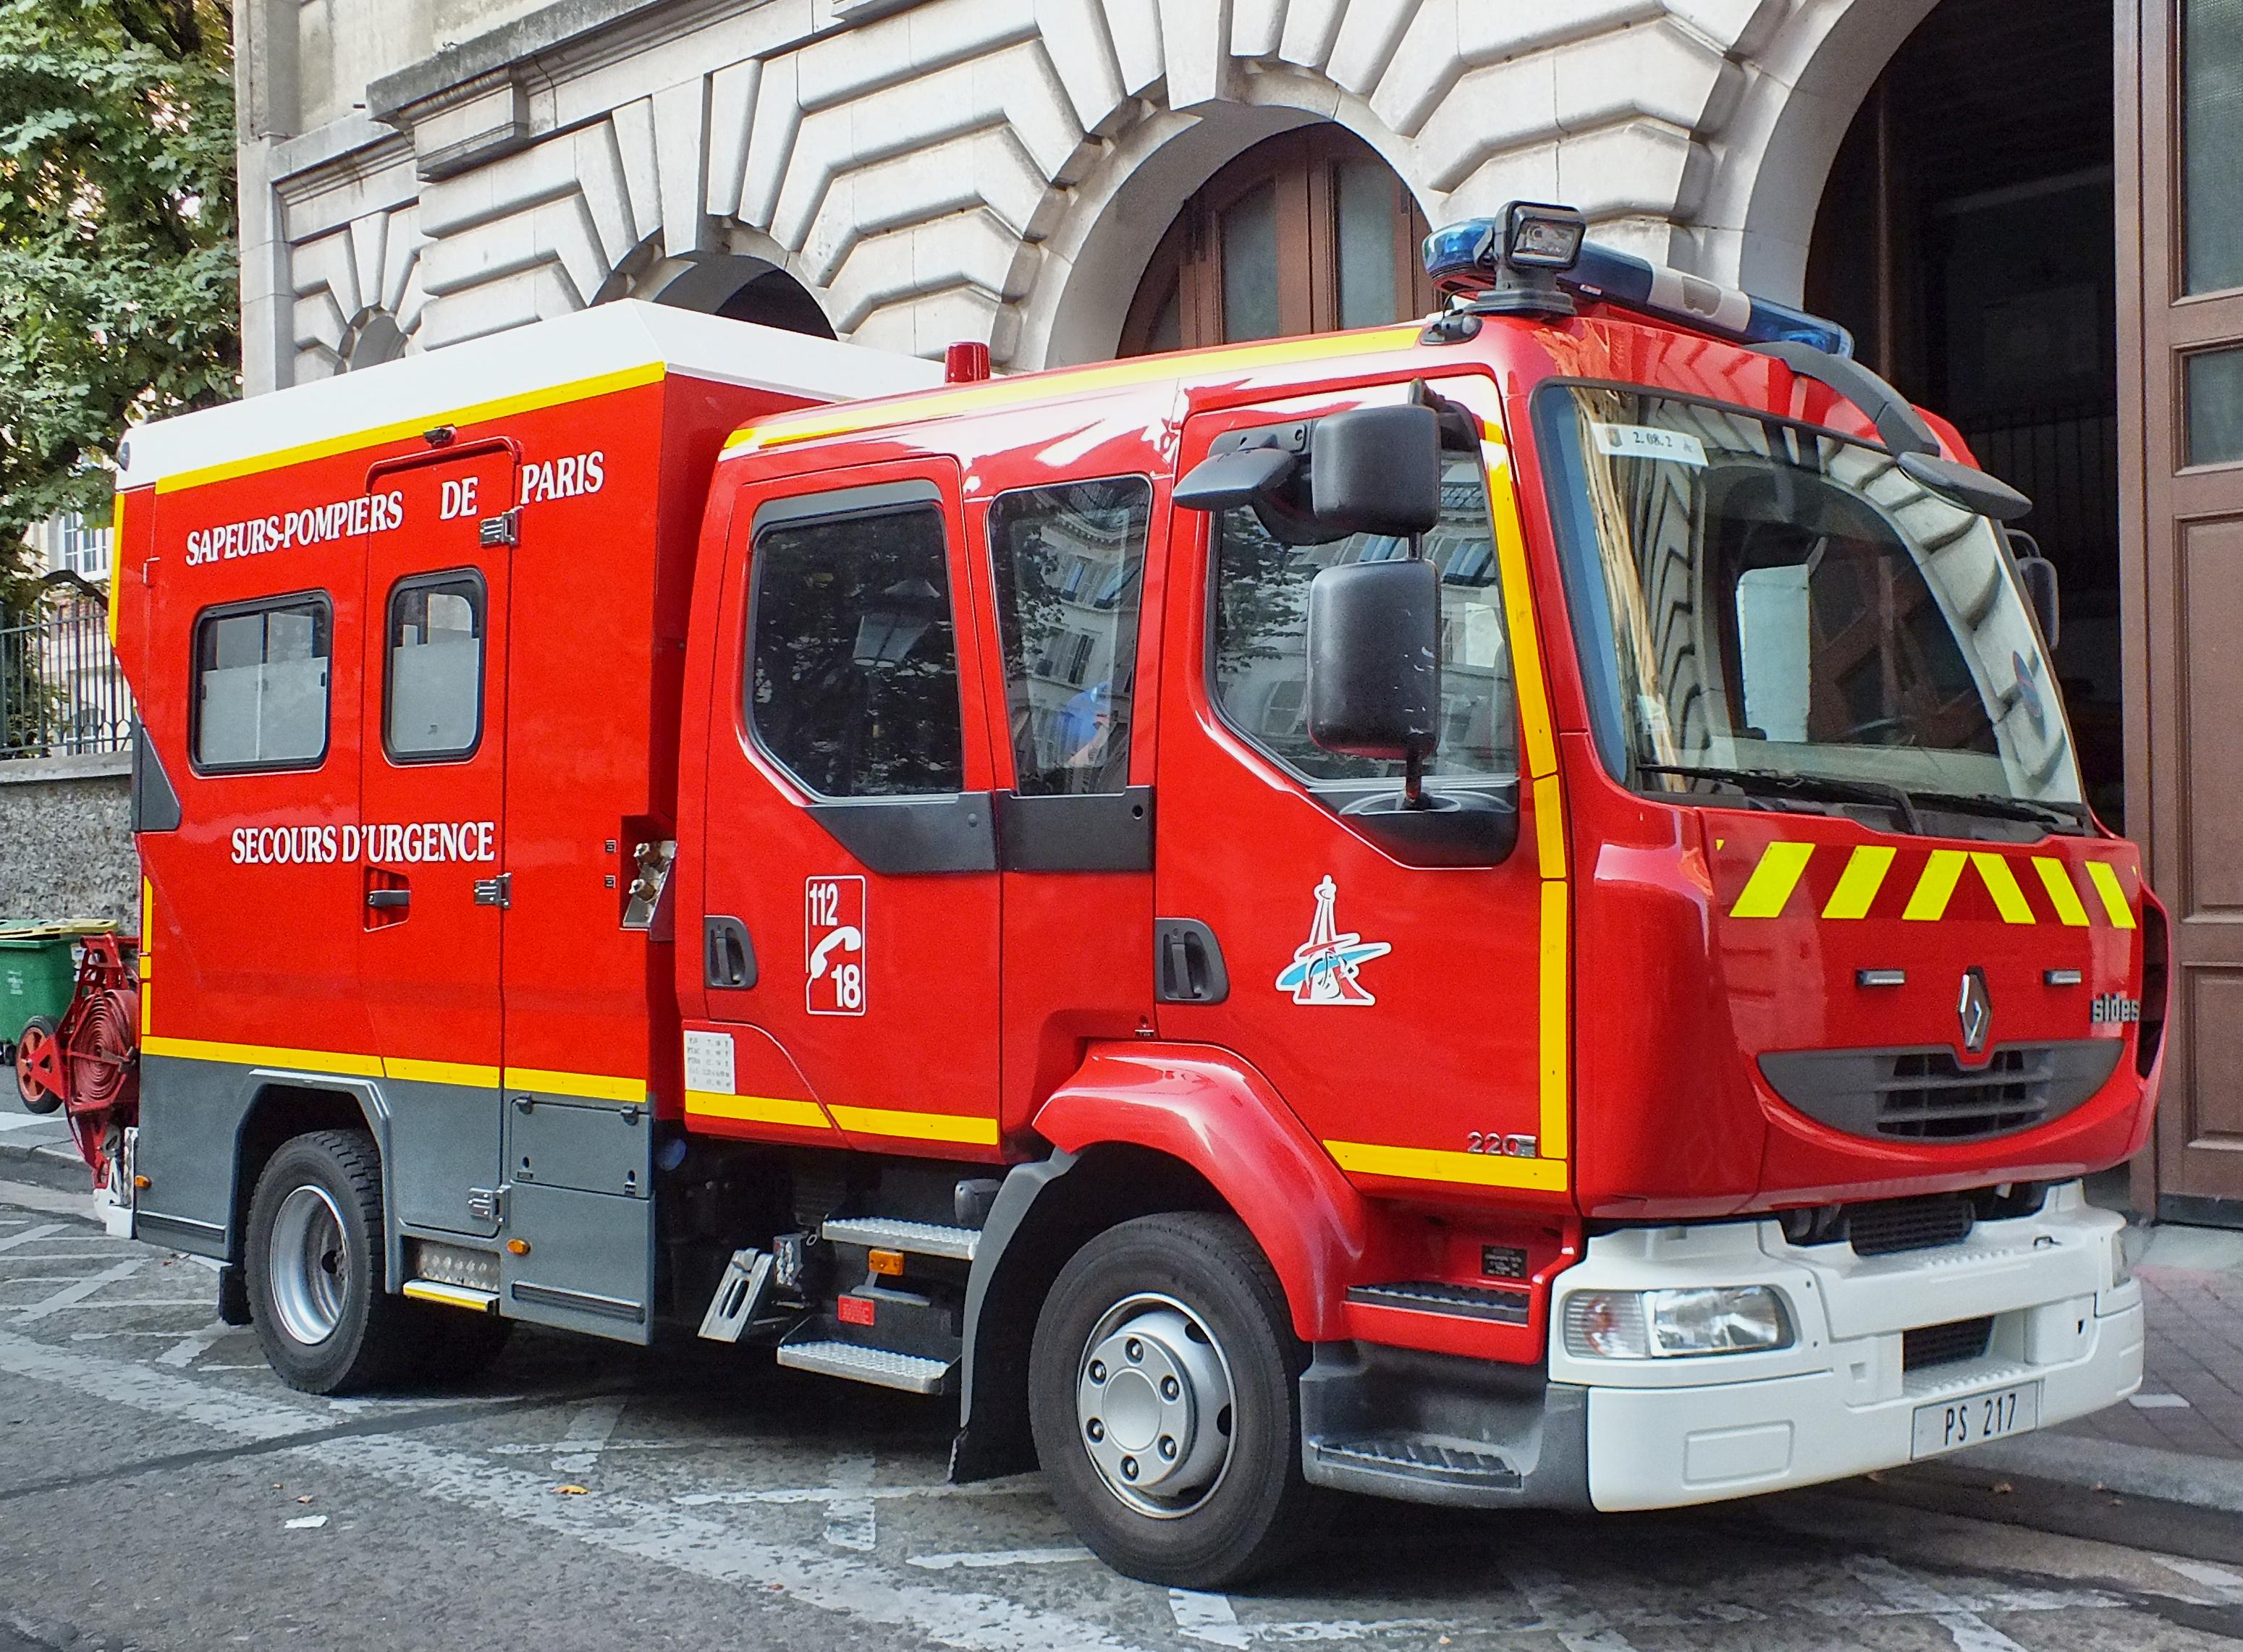 Bakgrundsbilder motorfordon fordon brand apparater for Motor vehicle services division